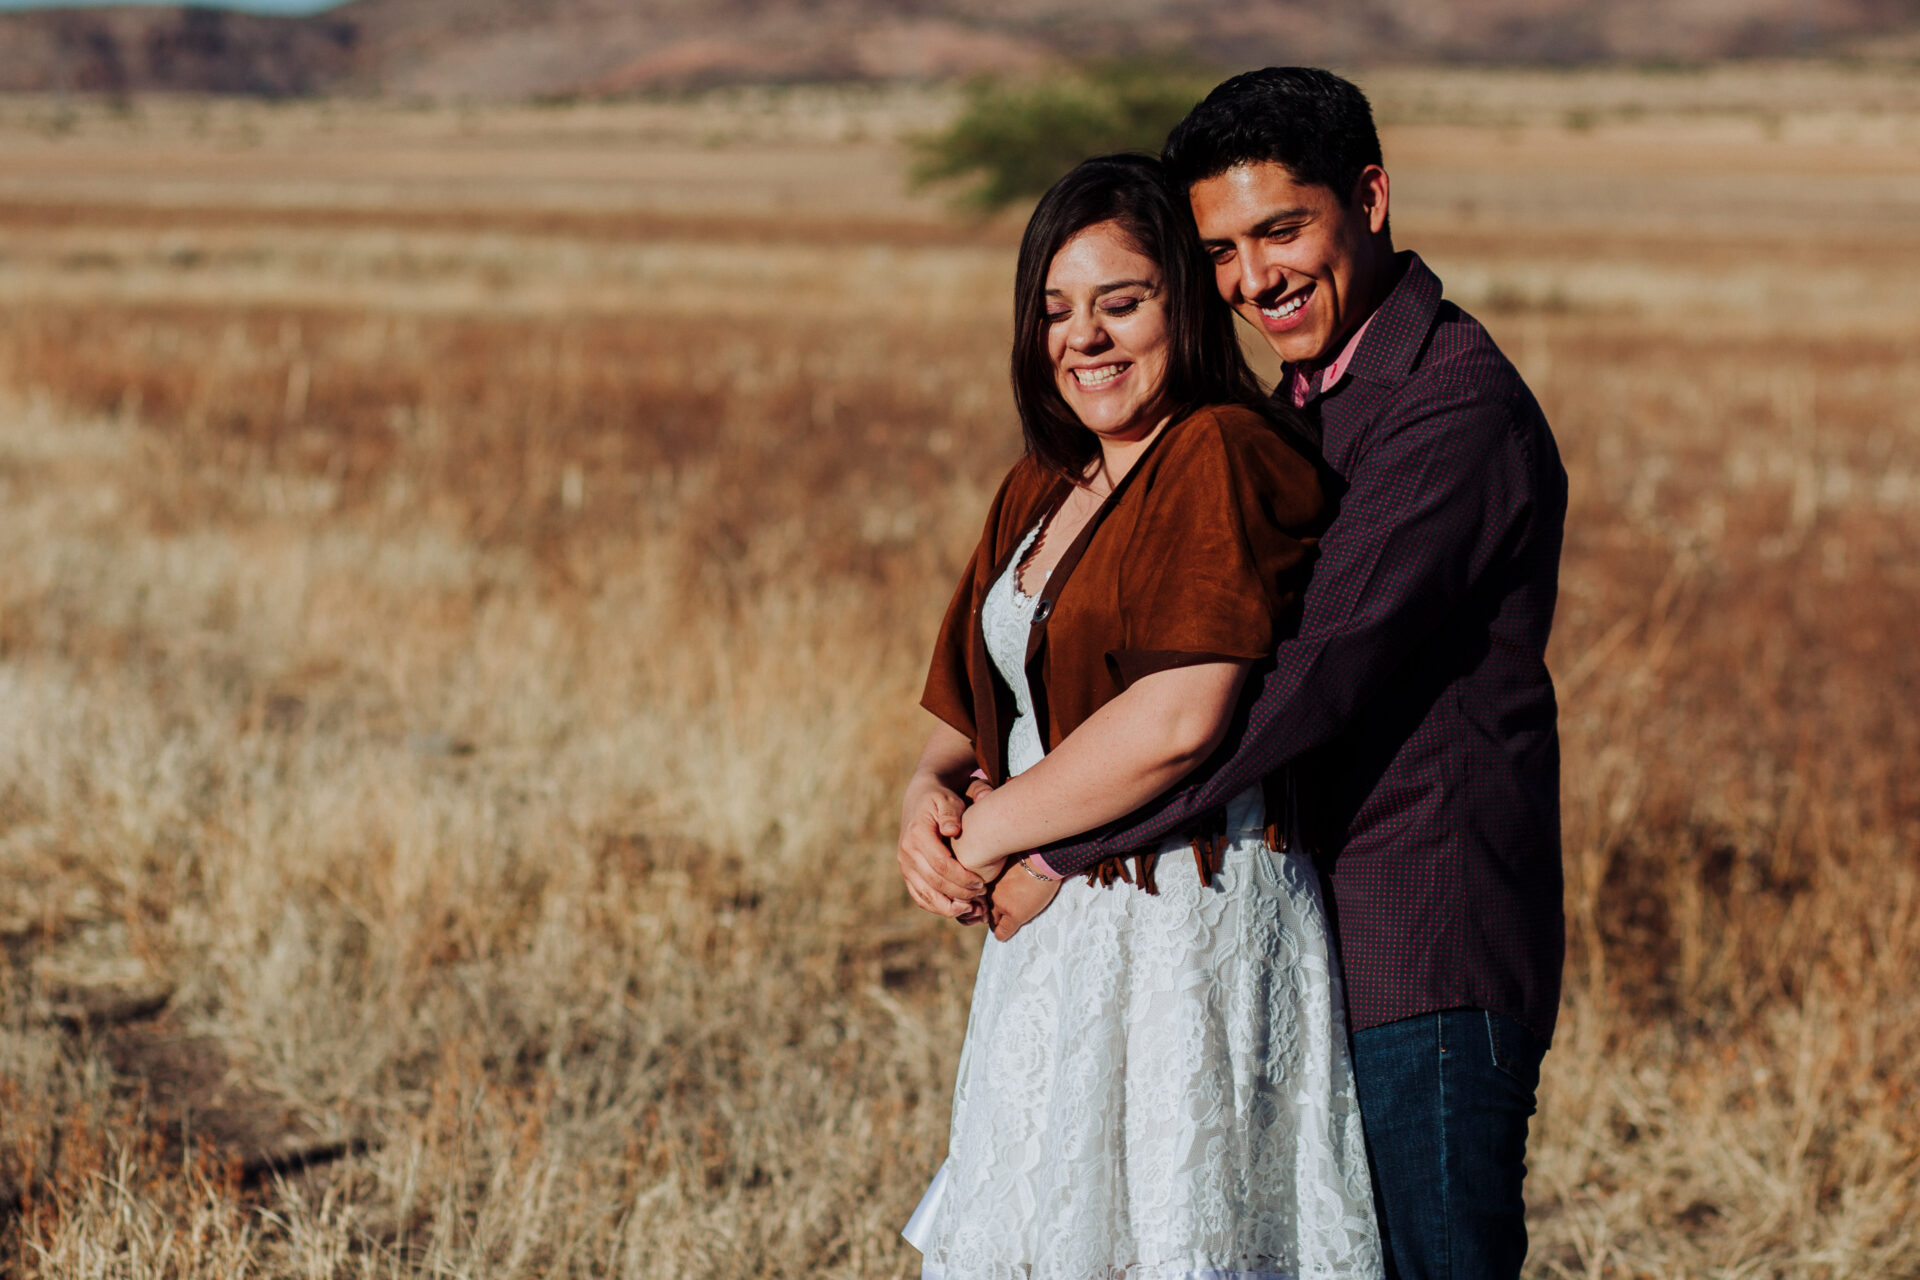 javier_noriega_fotografo_bodas_zacatecas_chihuahua_wedding_photographer15